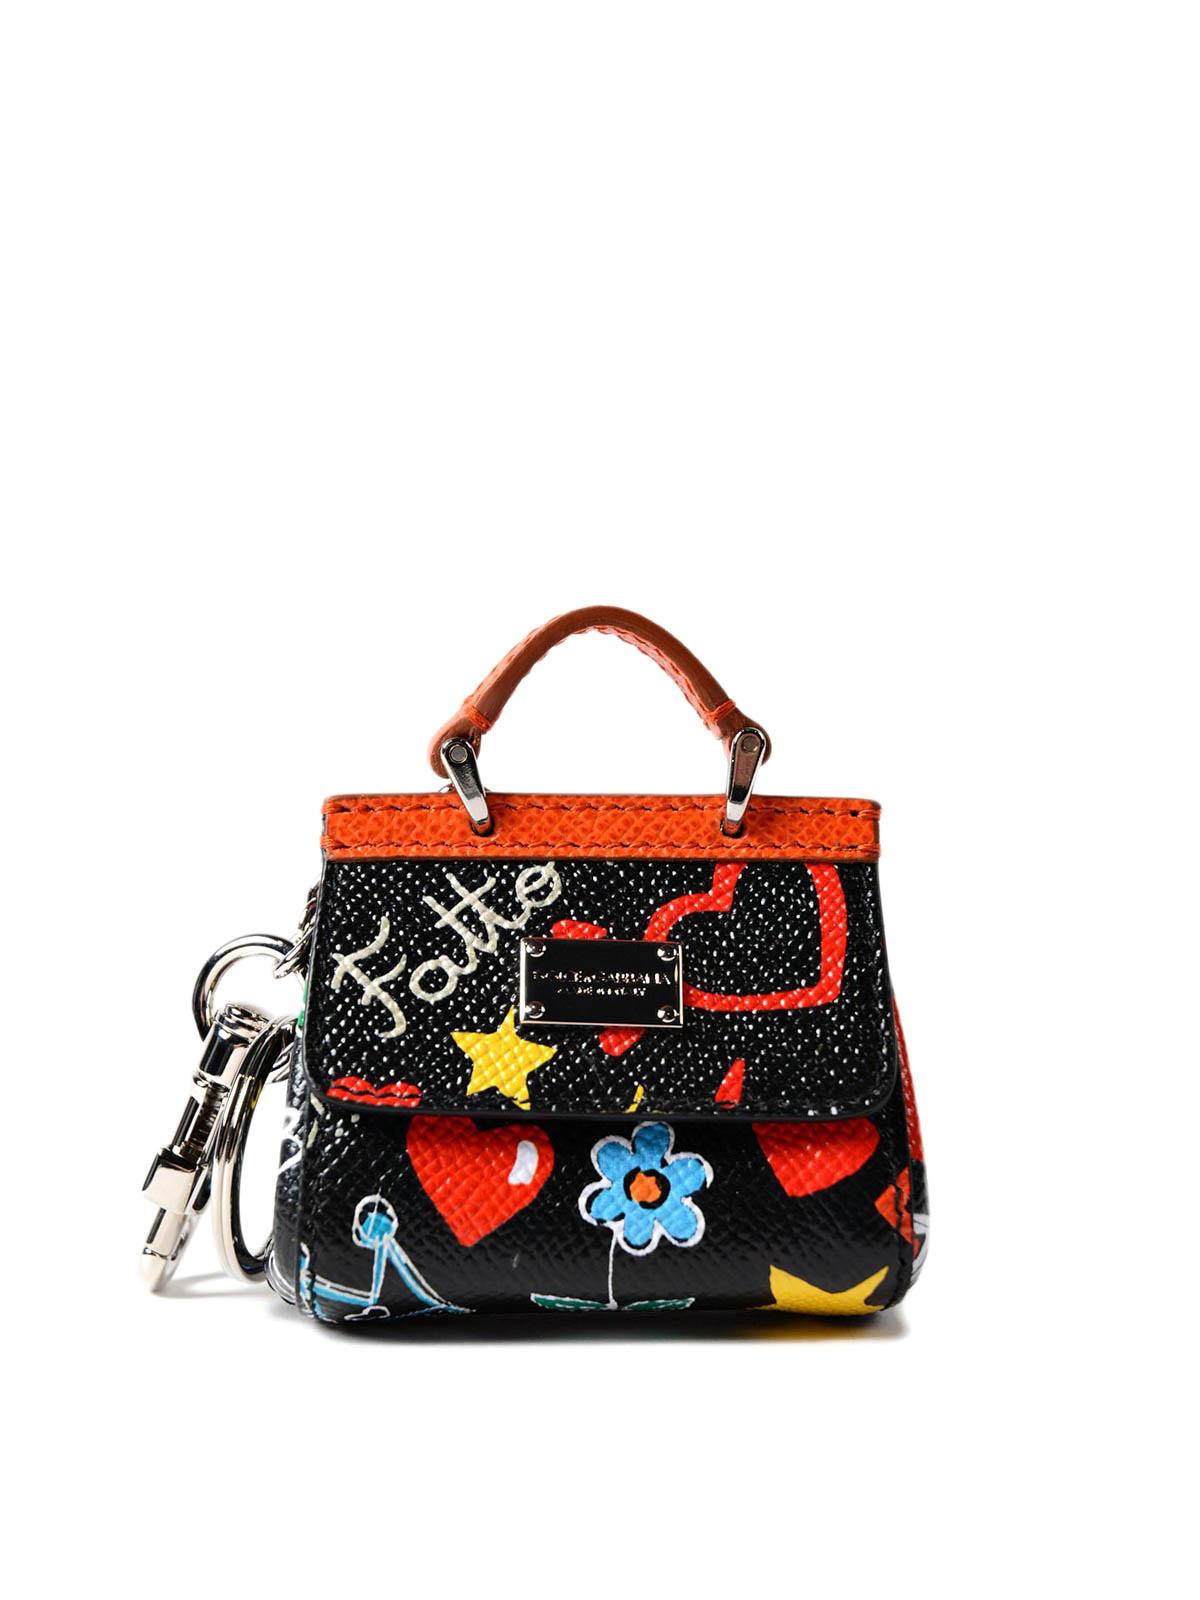 645bf12cb7e0 Dolce   Gabbana - Schlüsselanhänger - Bunt - Schlüsselanhänger ...